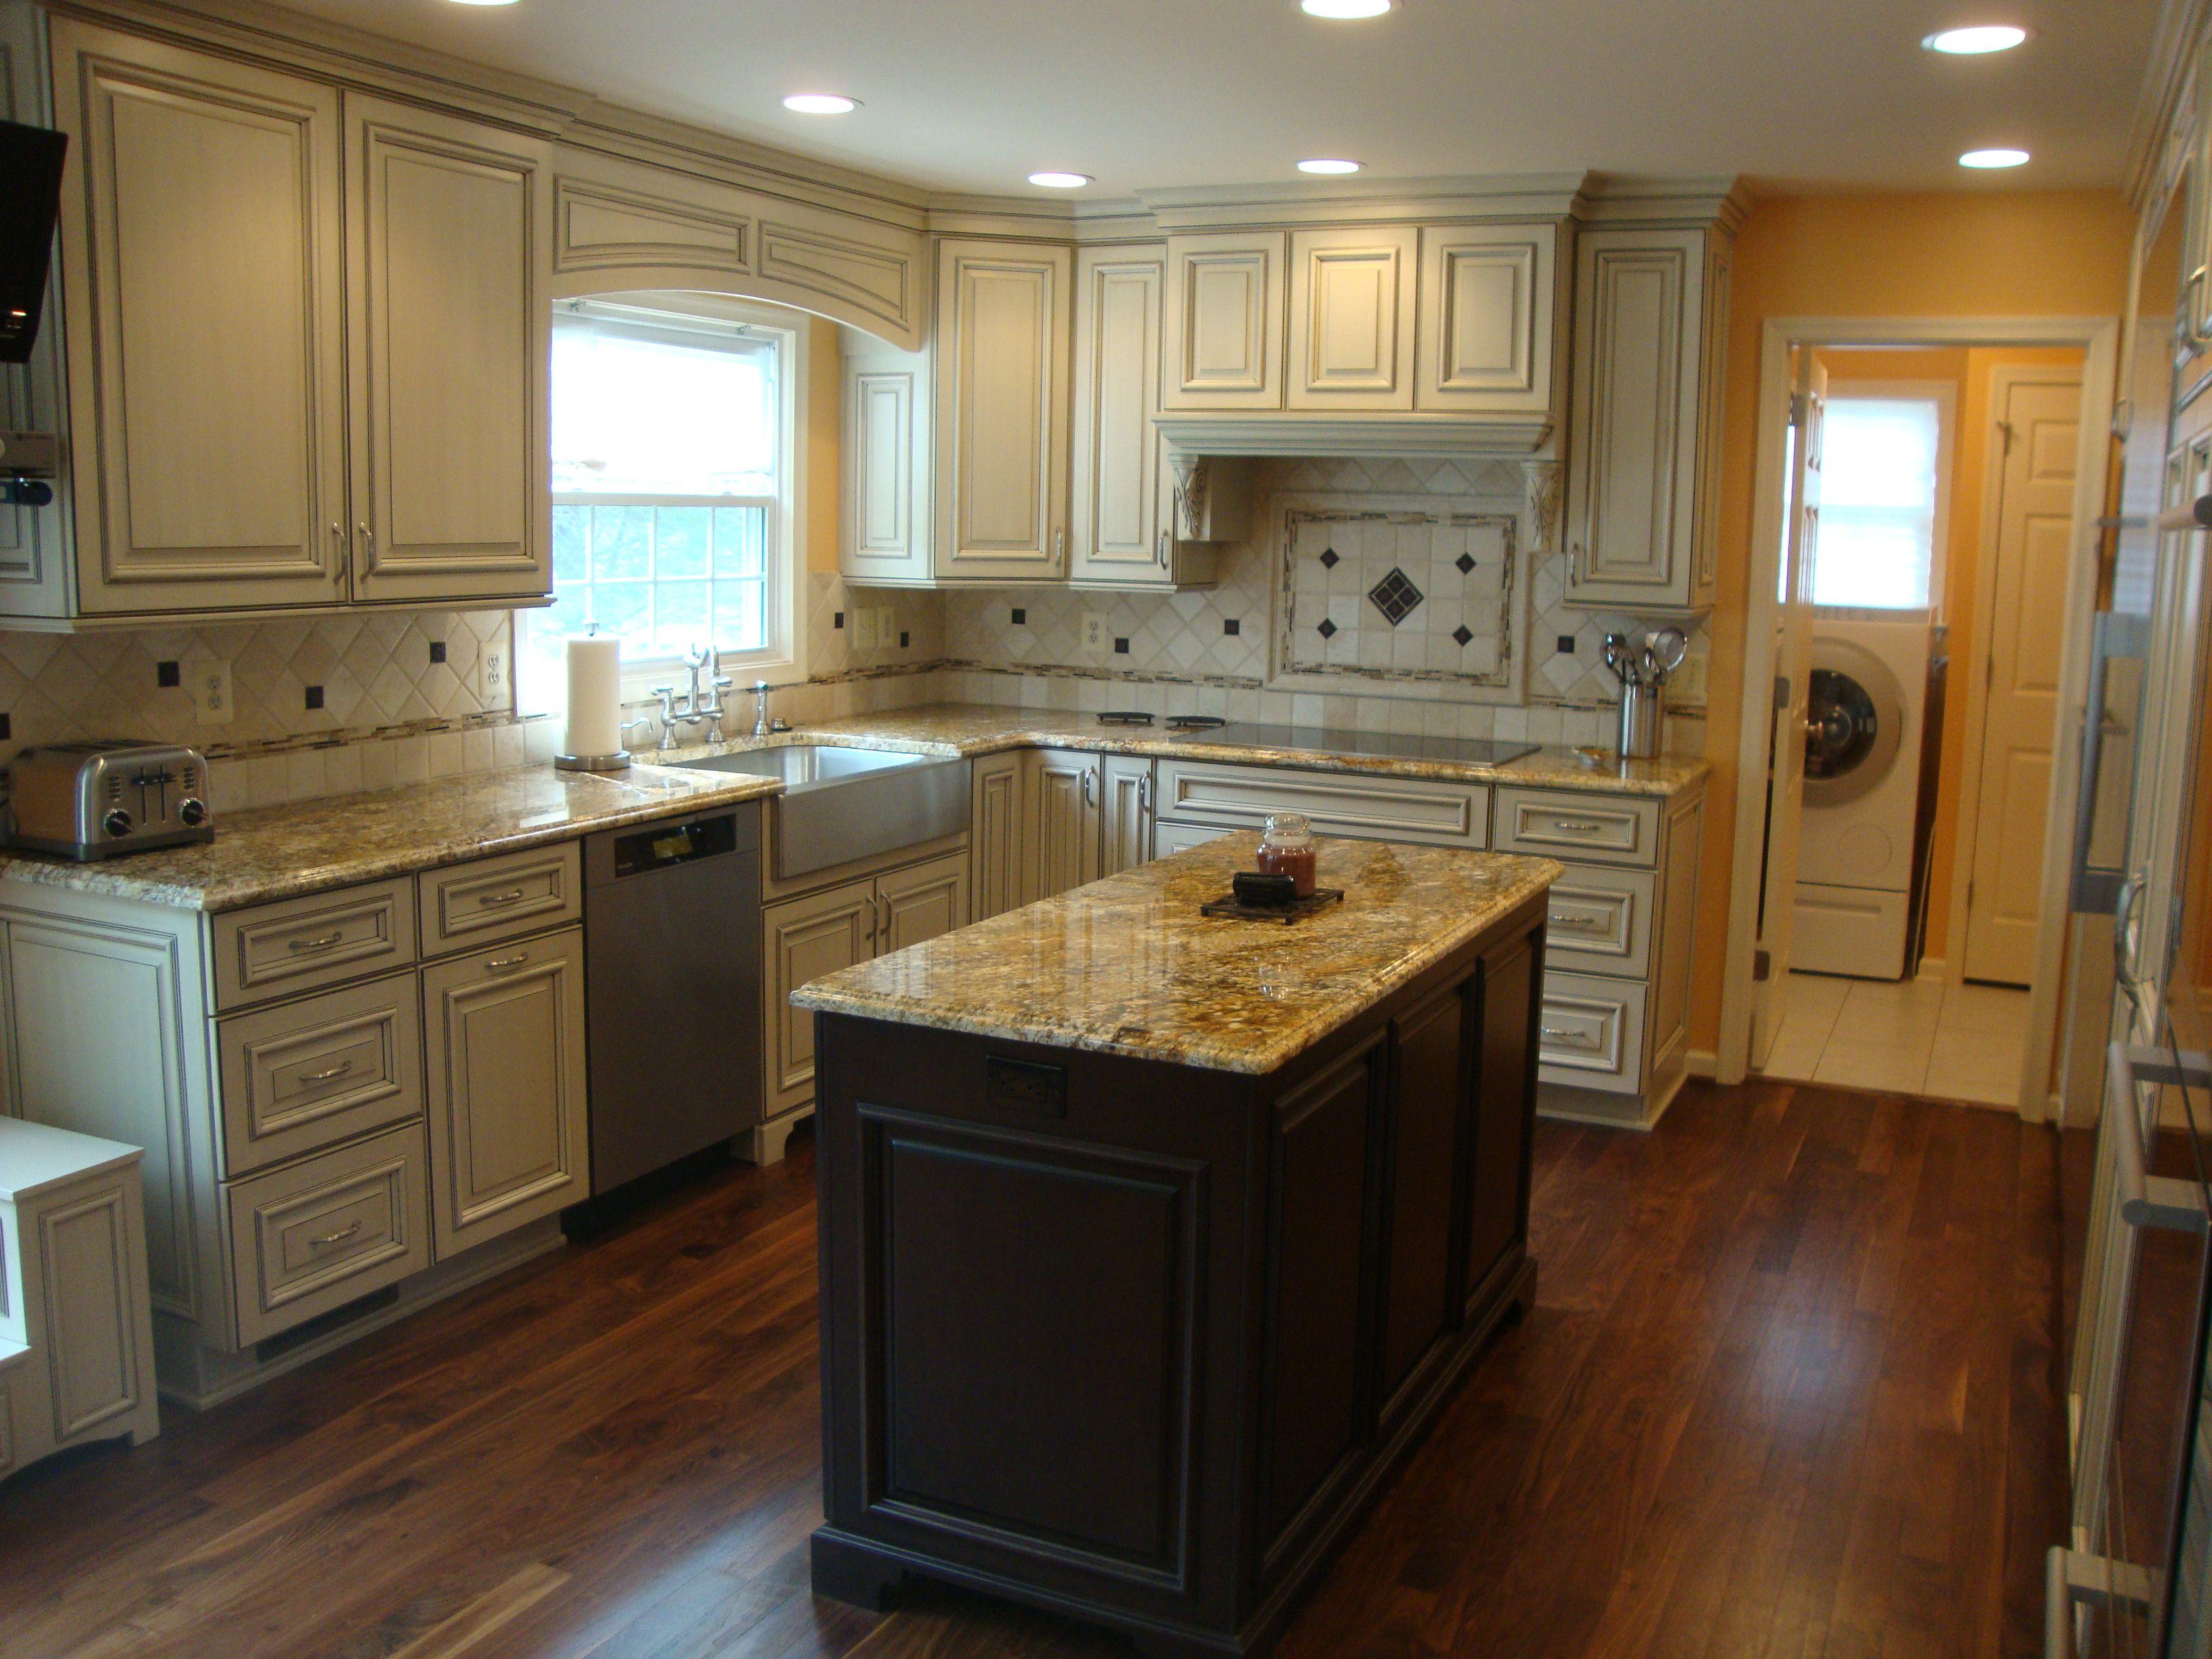 White L Shaped Kitchen Design with Black Island Kitchen